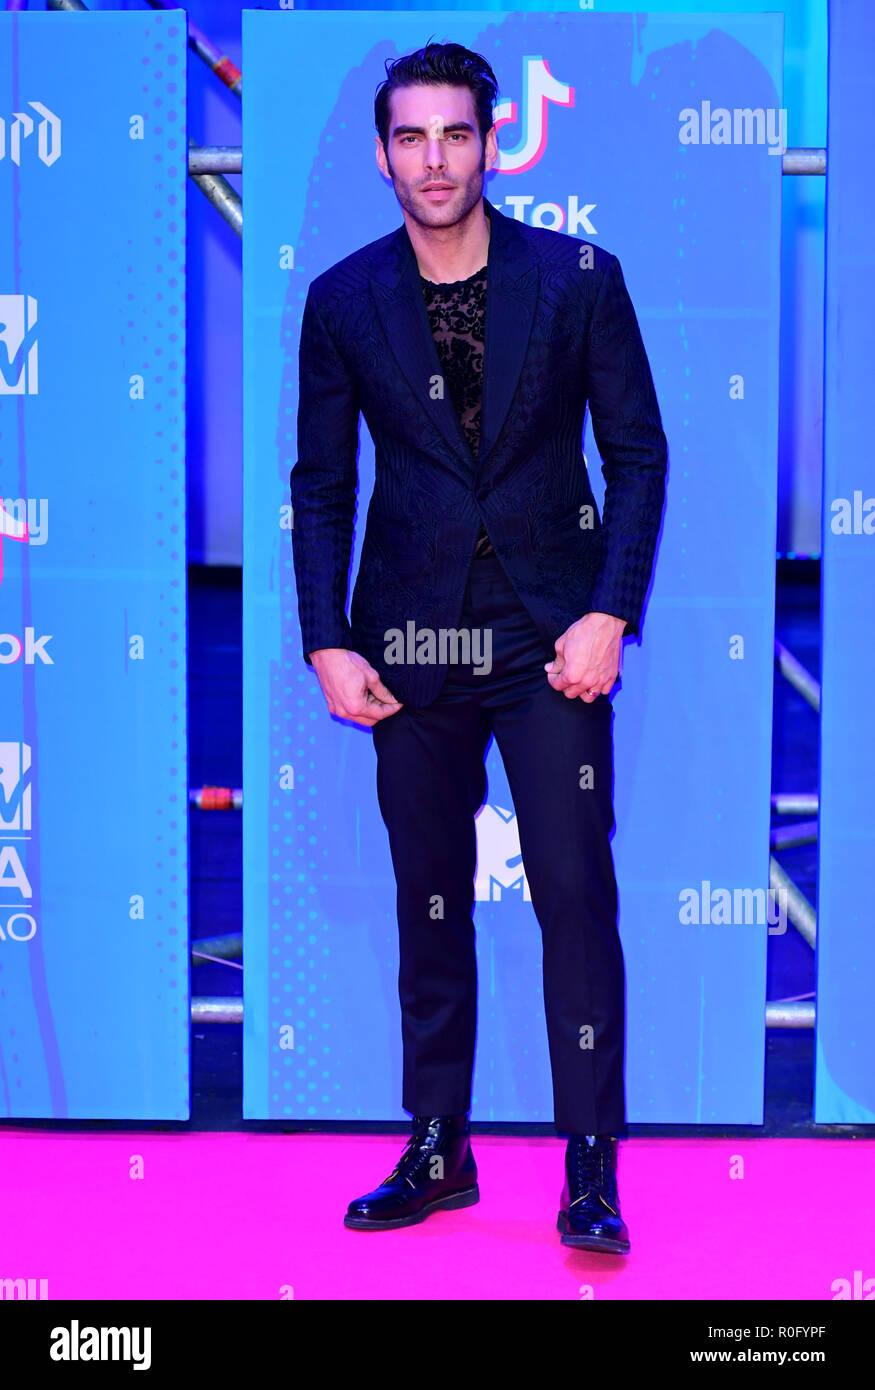 Jon Kortajarena Attending The Mtv Europe Music Awards 2018 Held At